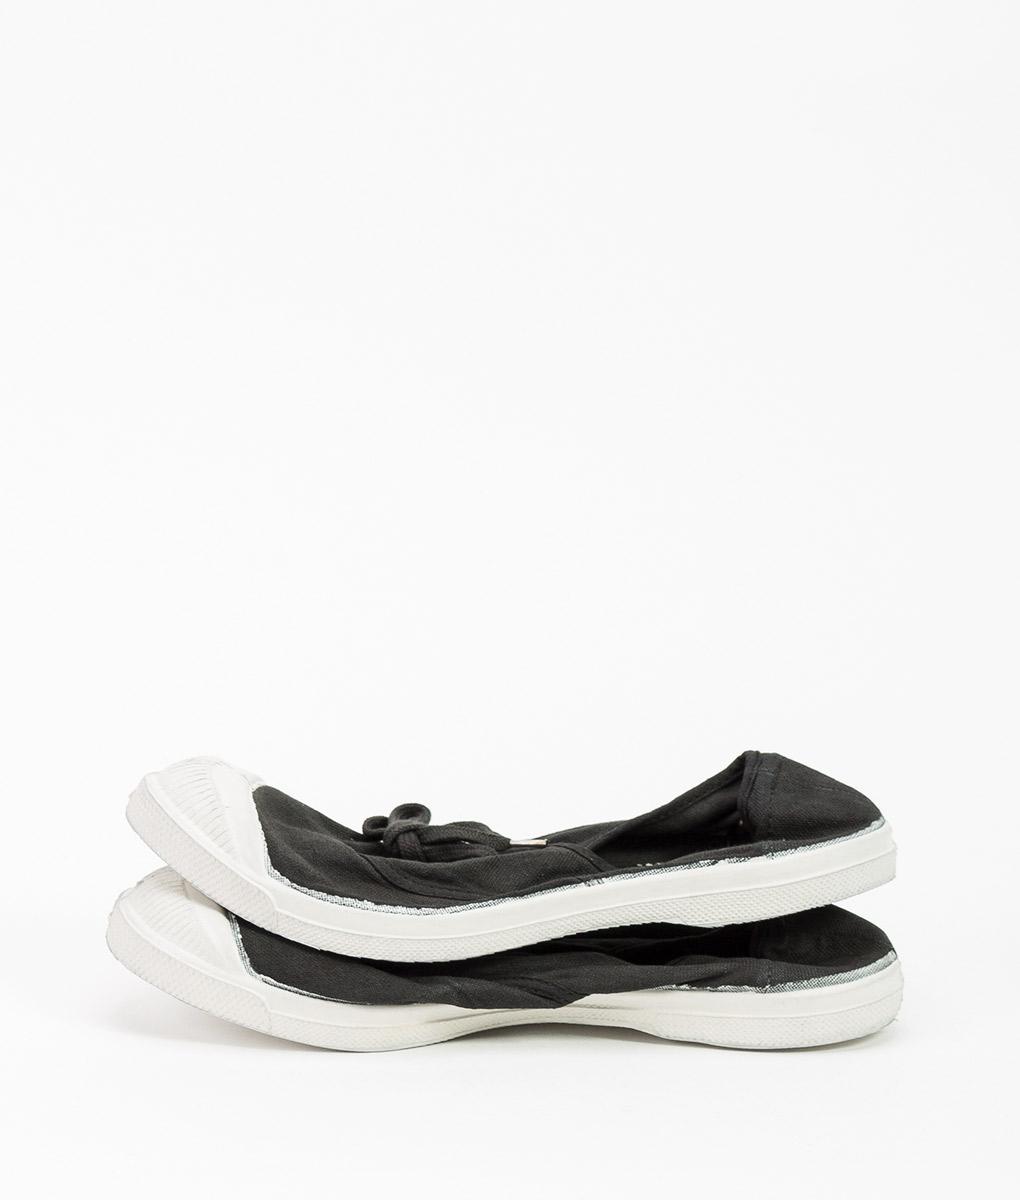 BENSIMON Women Sneakers 835 LACET Carbone 34.99